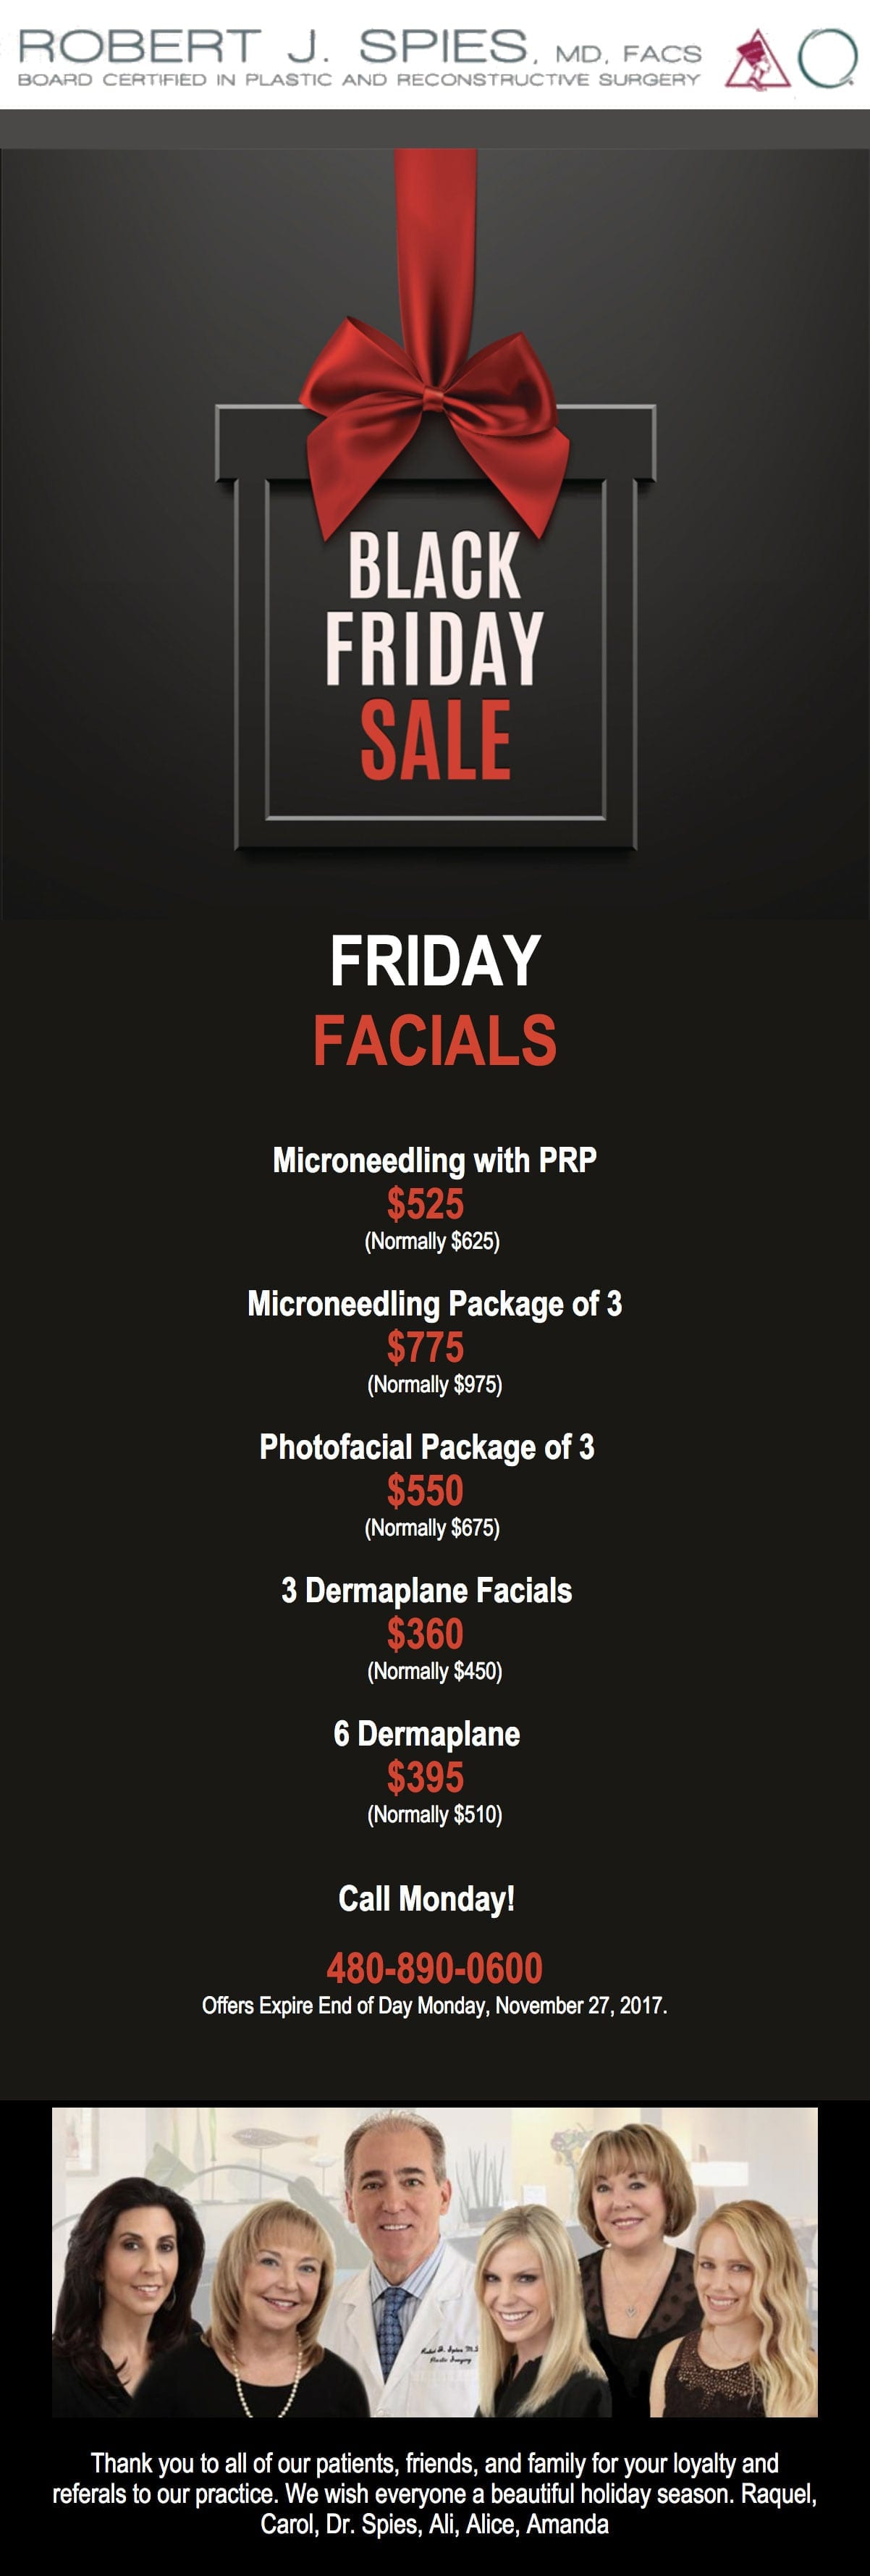 Black Friday Specials - Friday Facials!!